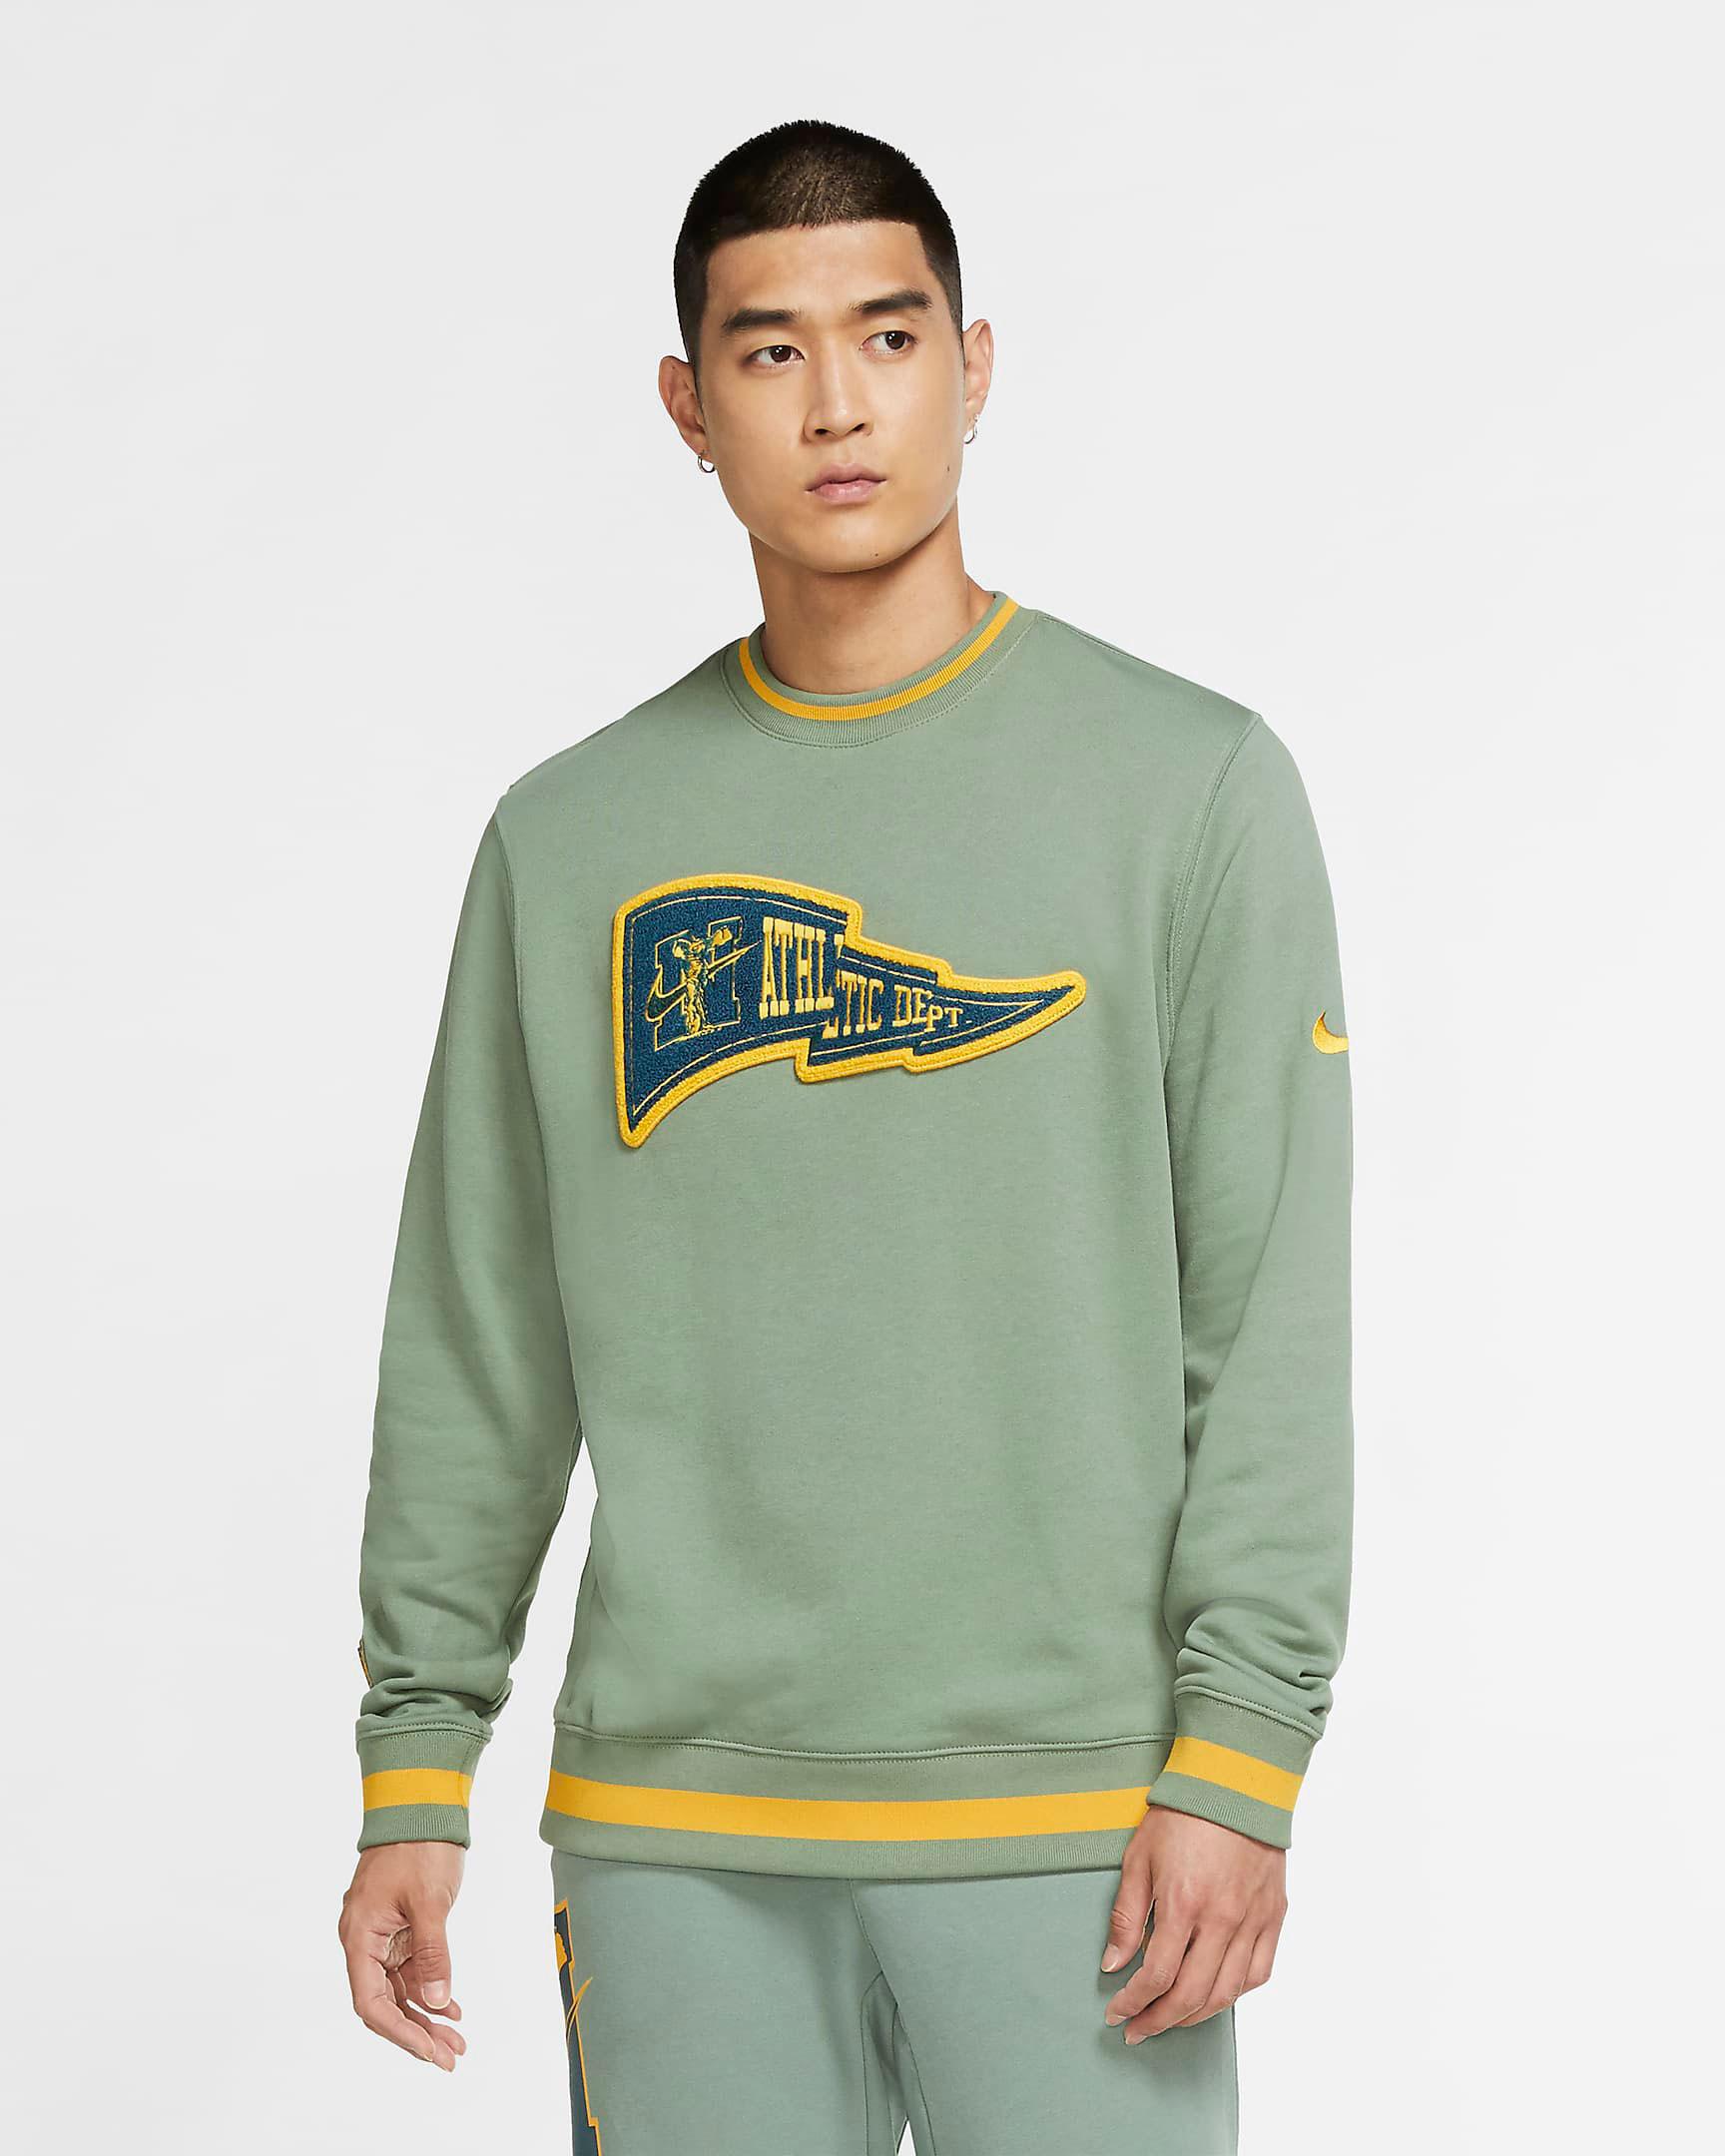 nike-air-max-1-spiral-sage-sweatshirt